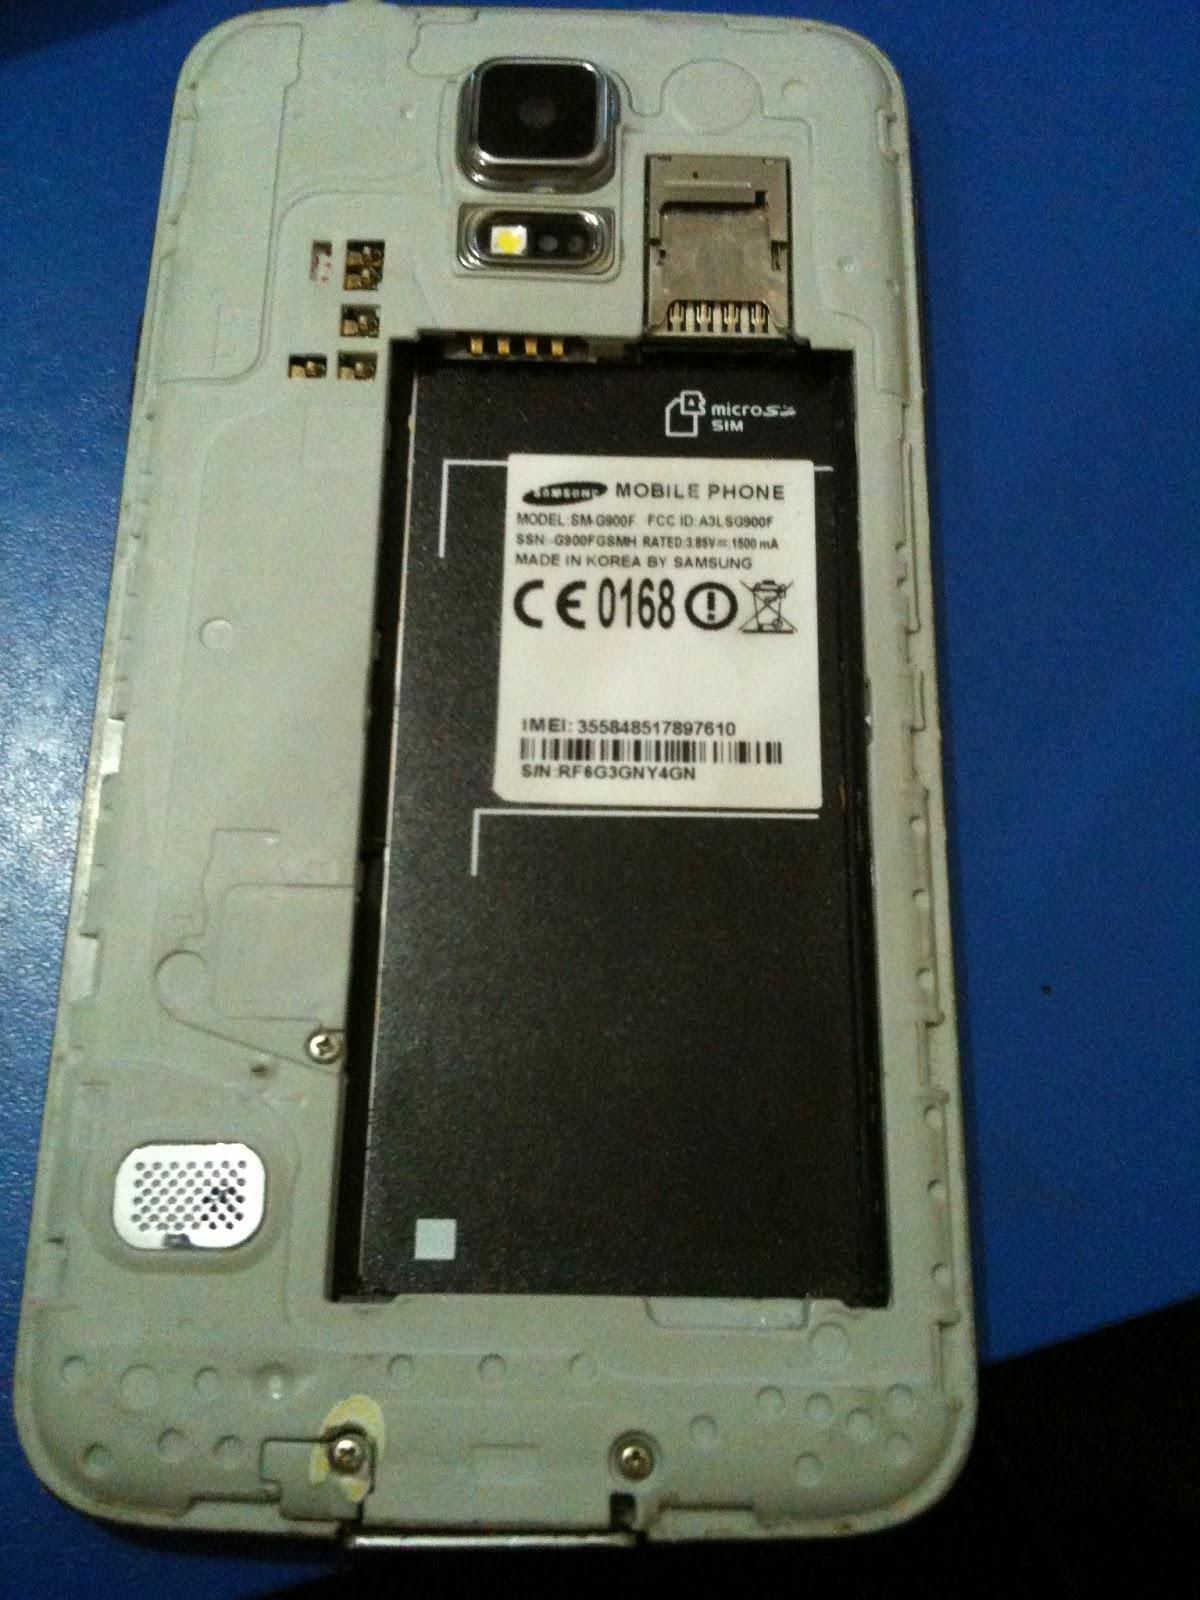 G900f firmware